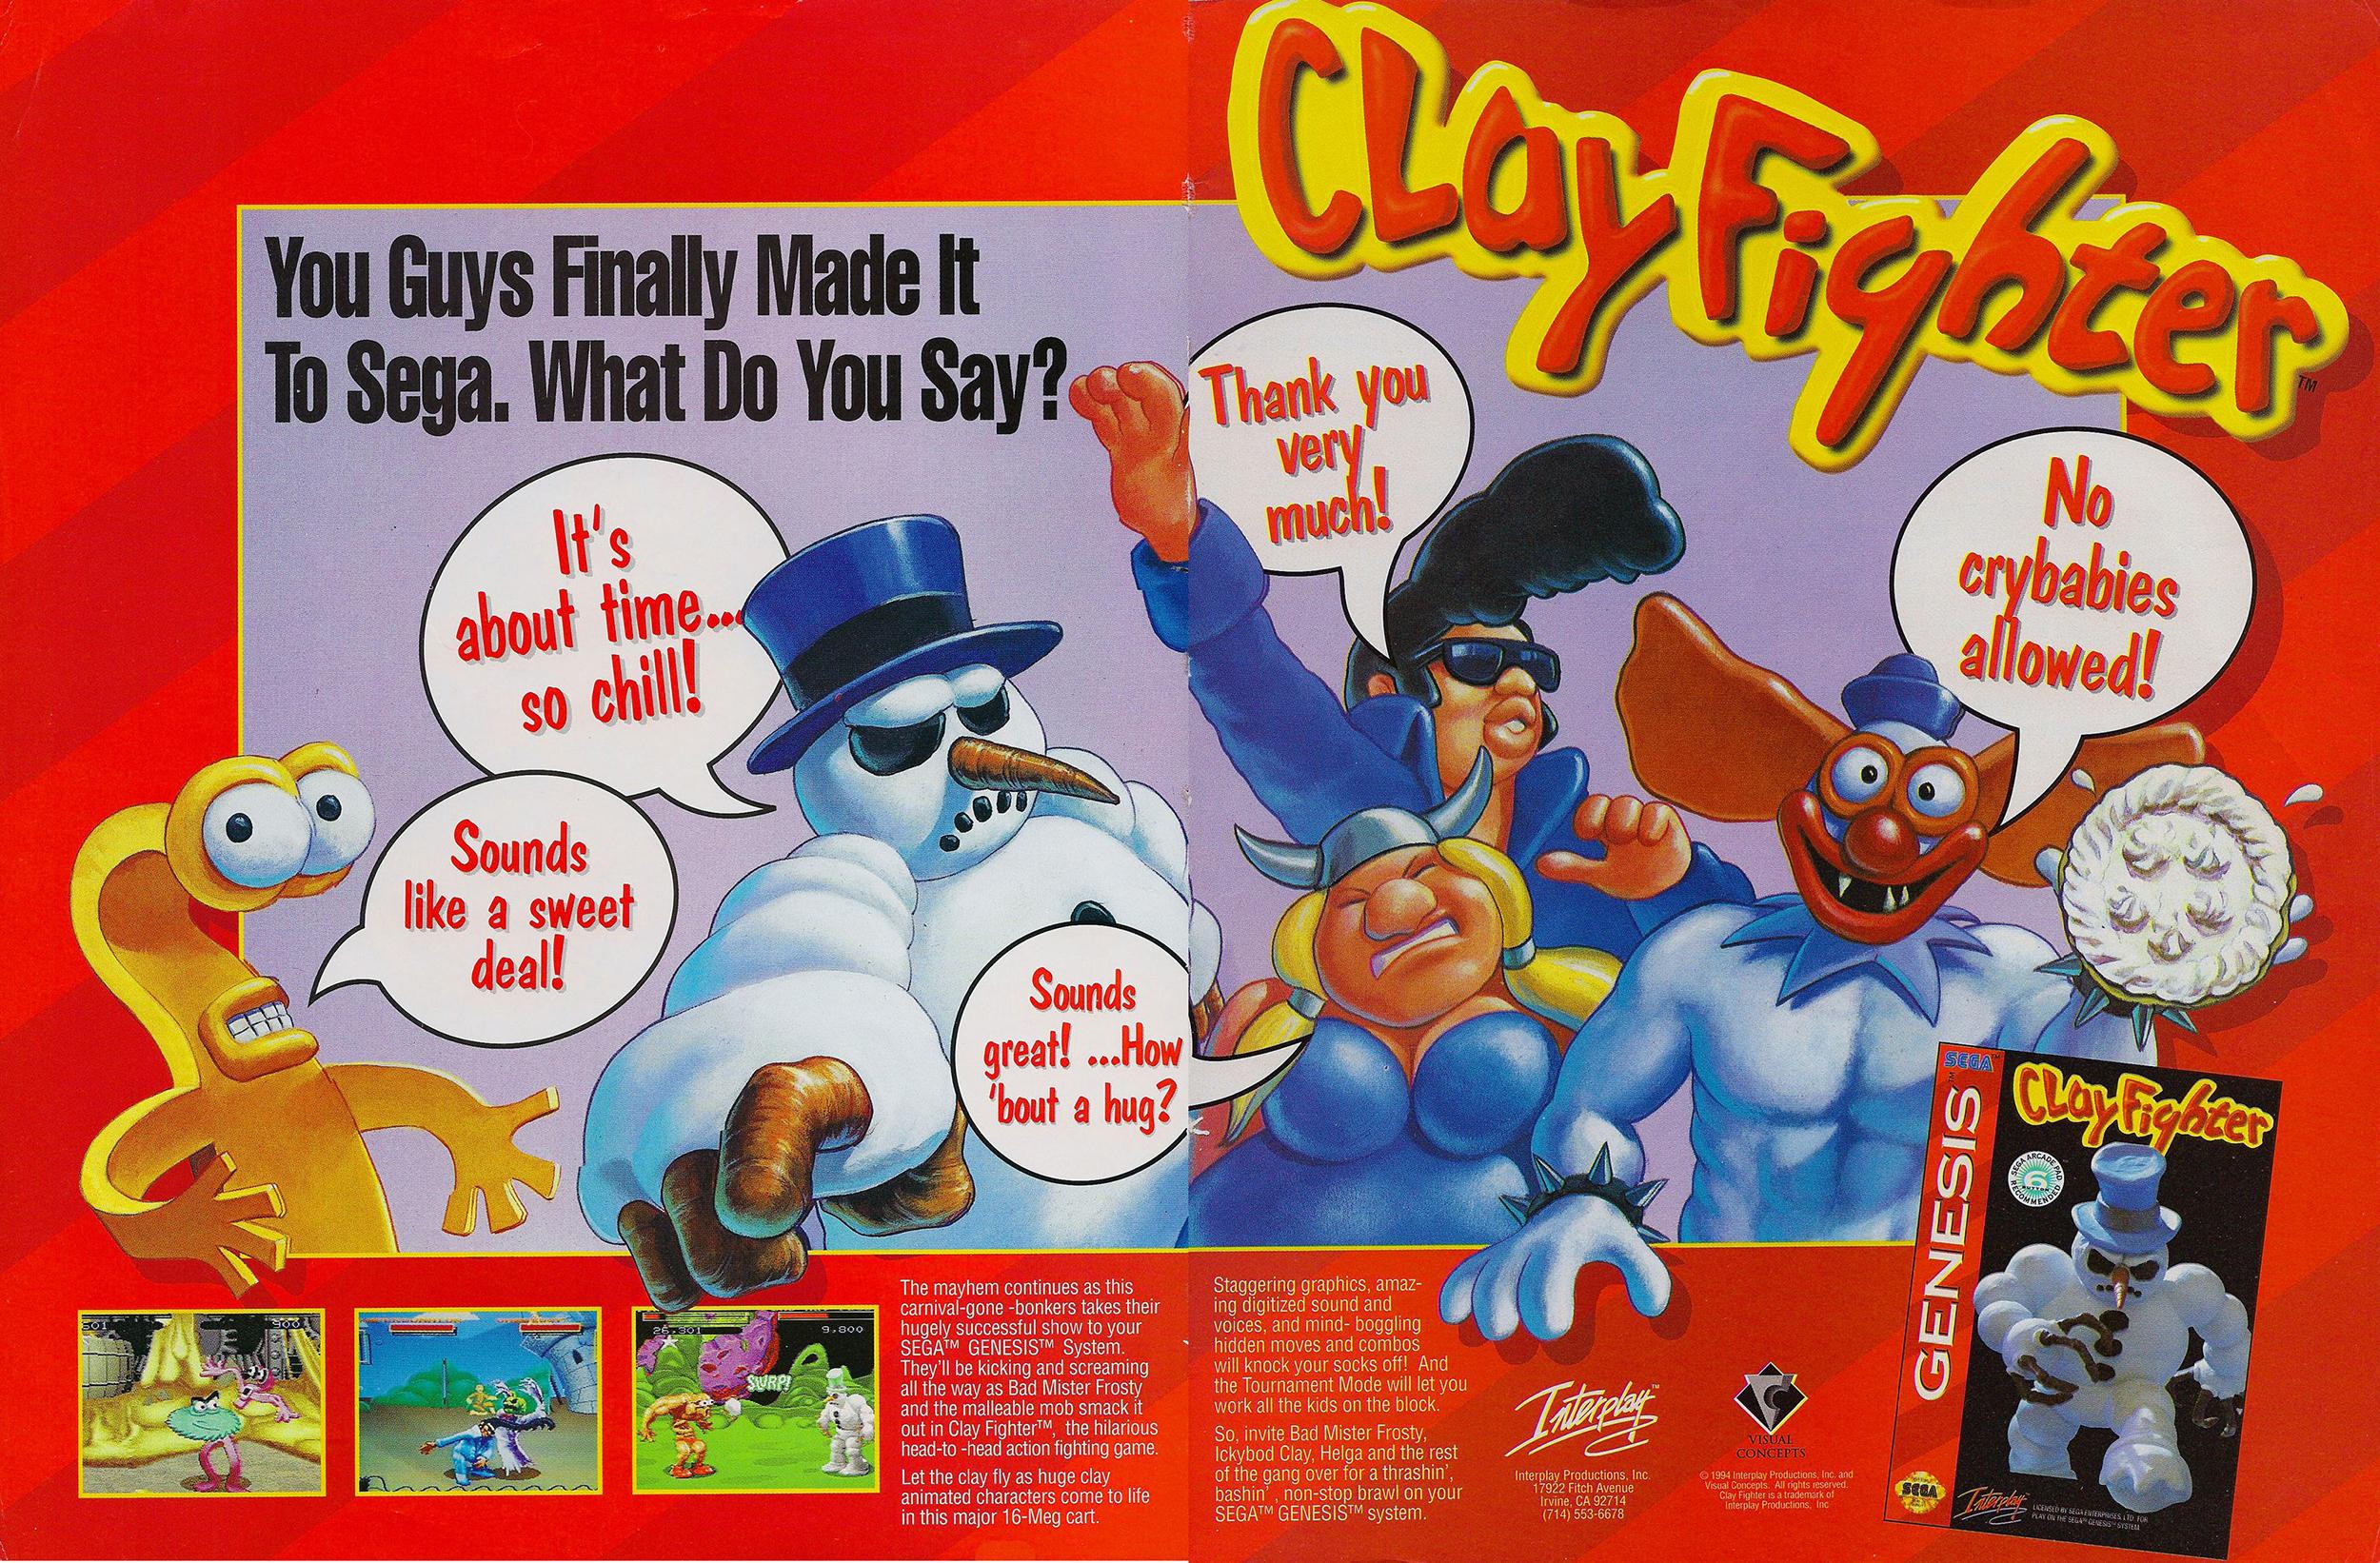 Clayfighter remaster